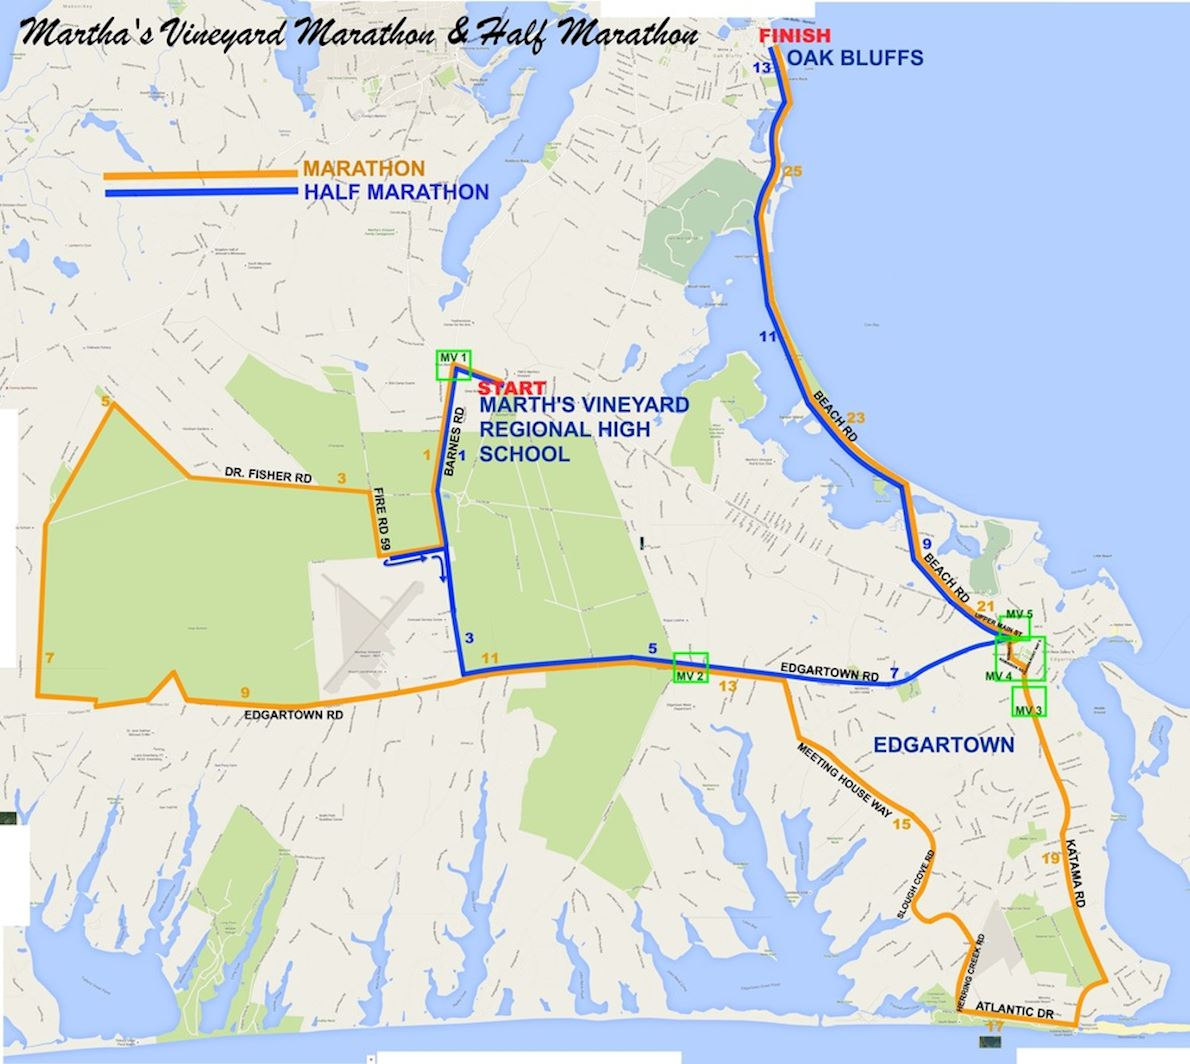 Martha's Vineyard Marathon & Half Marathon 路线图